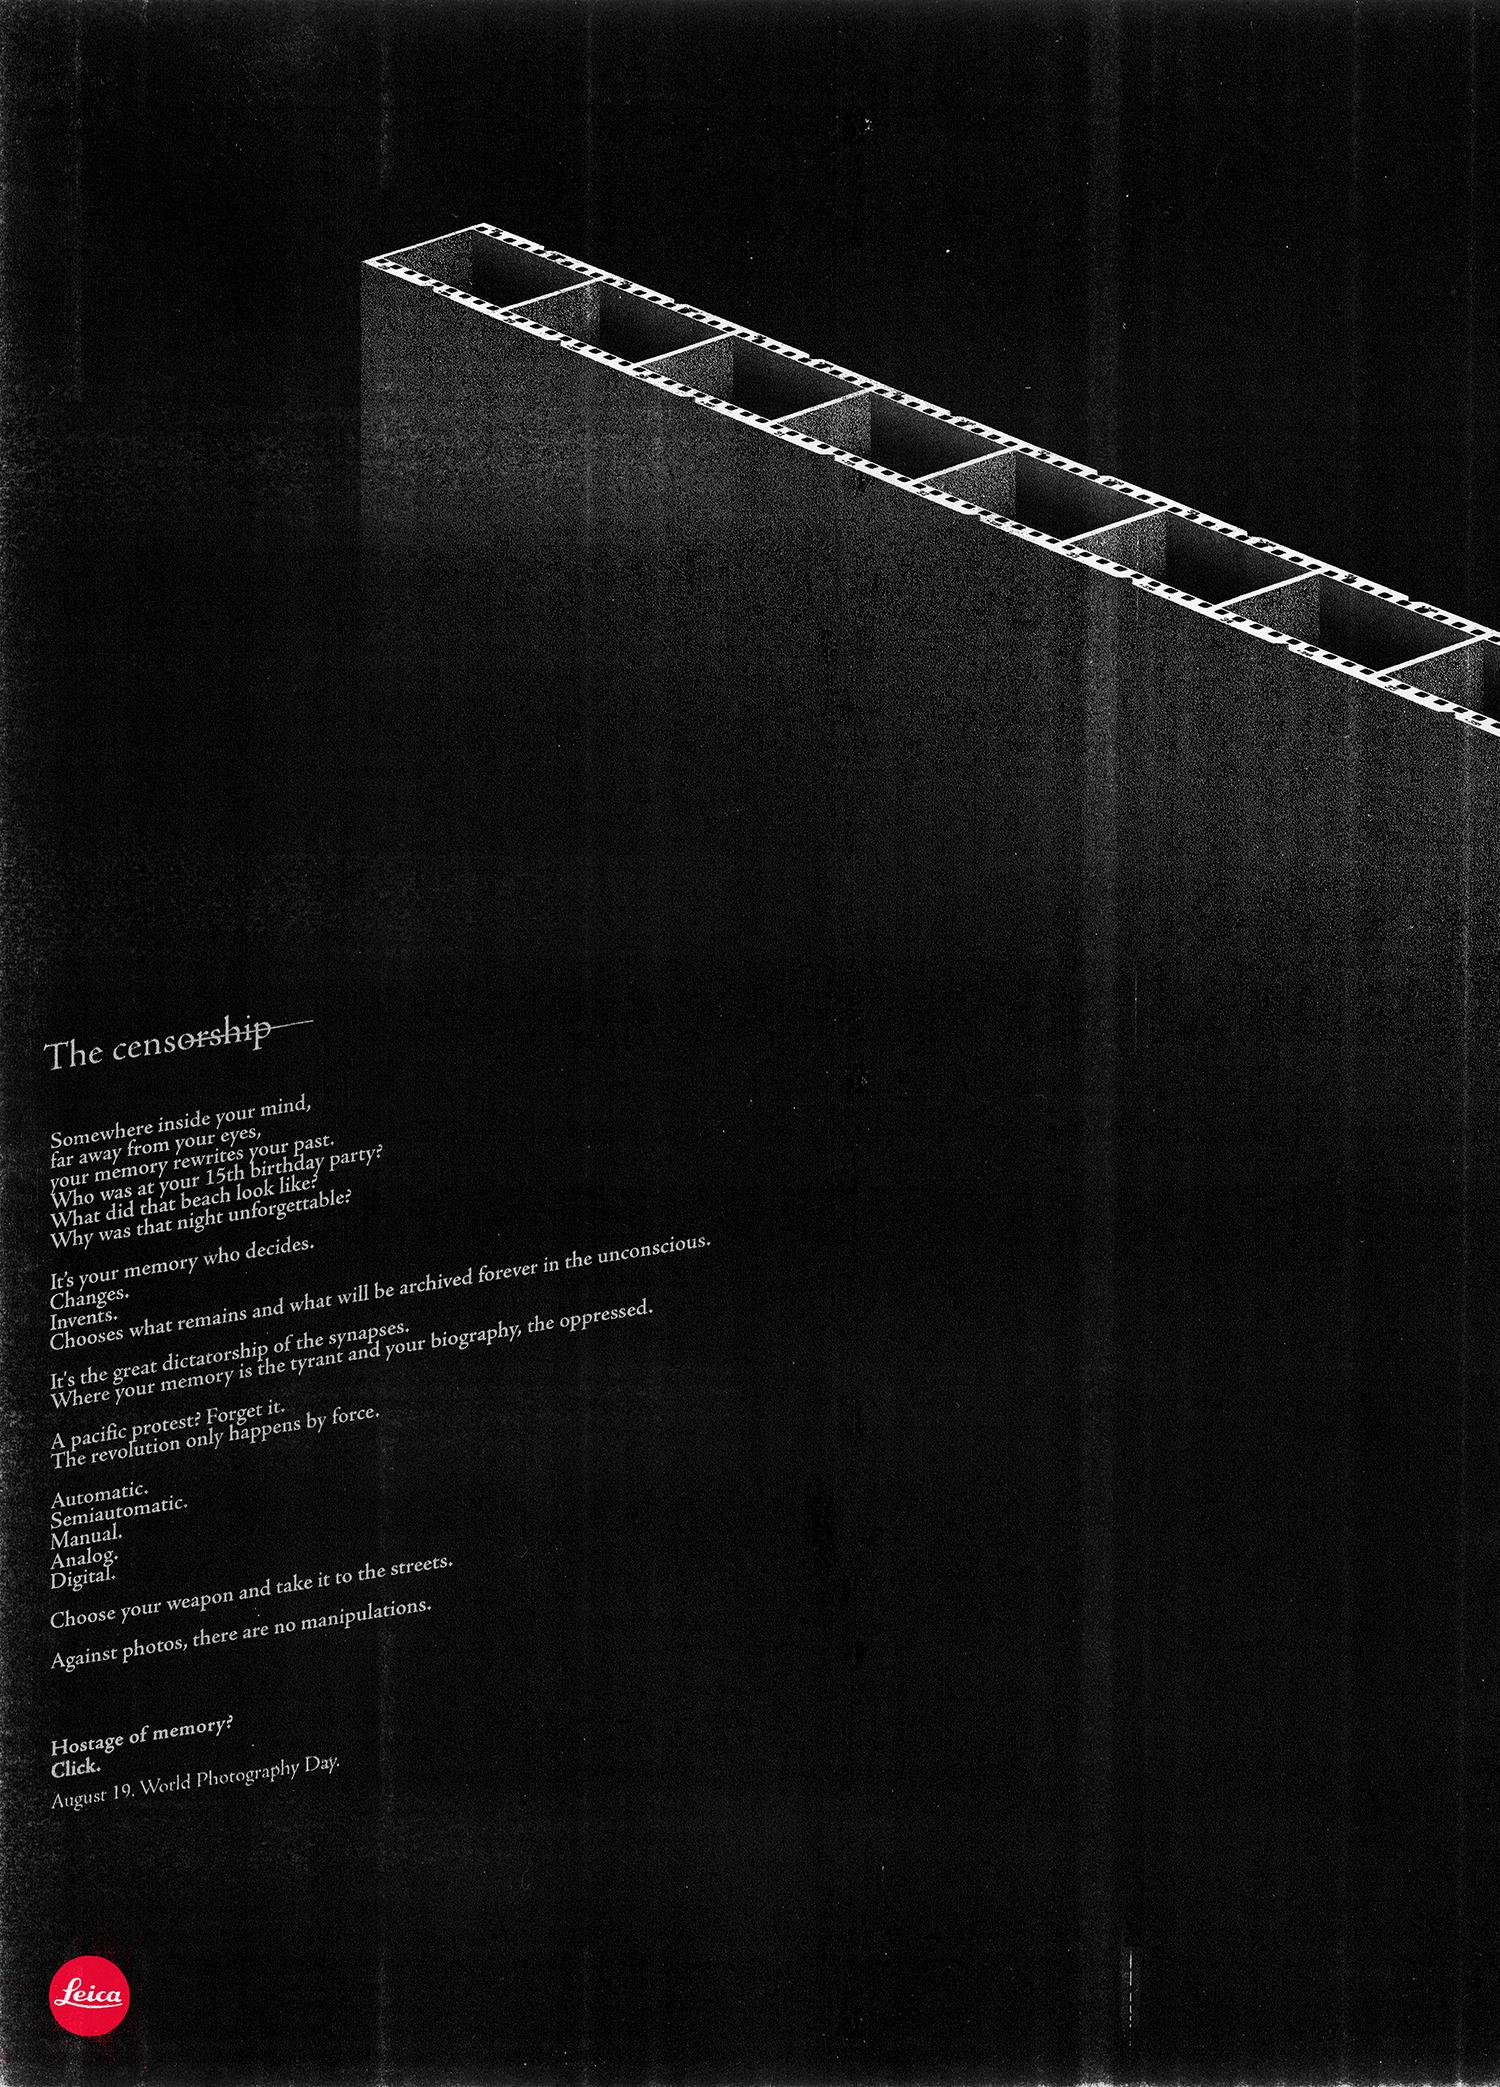 censorship-1500